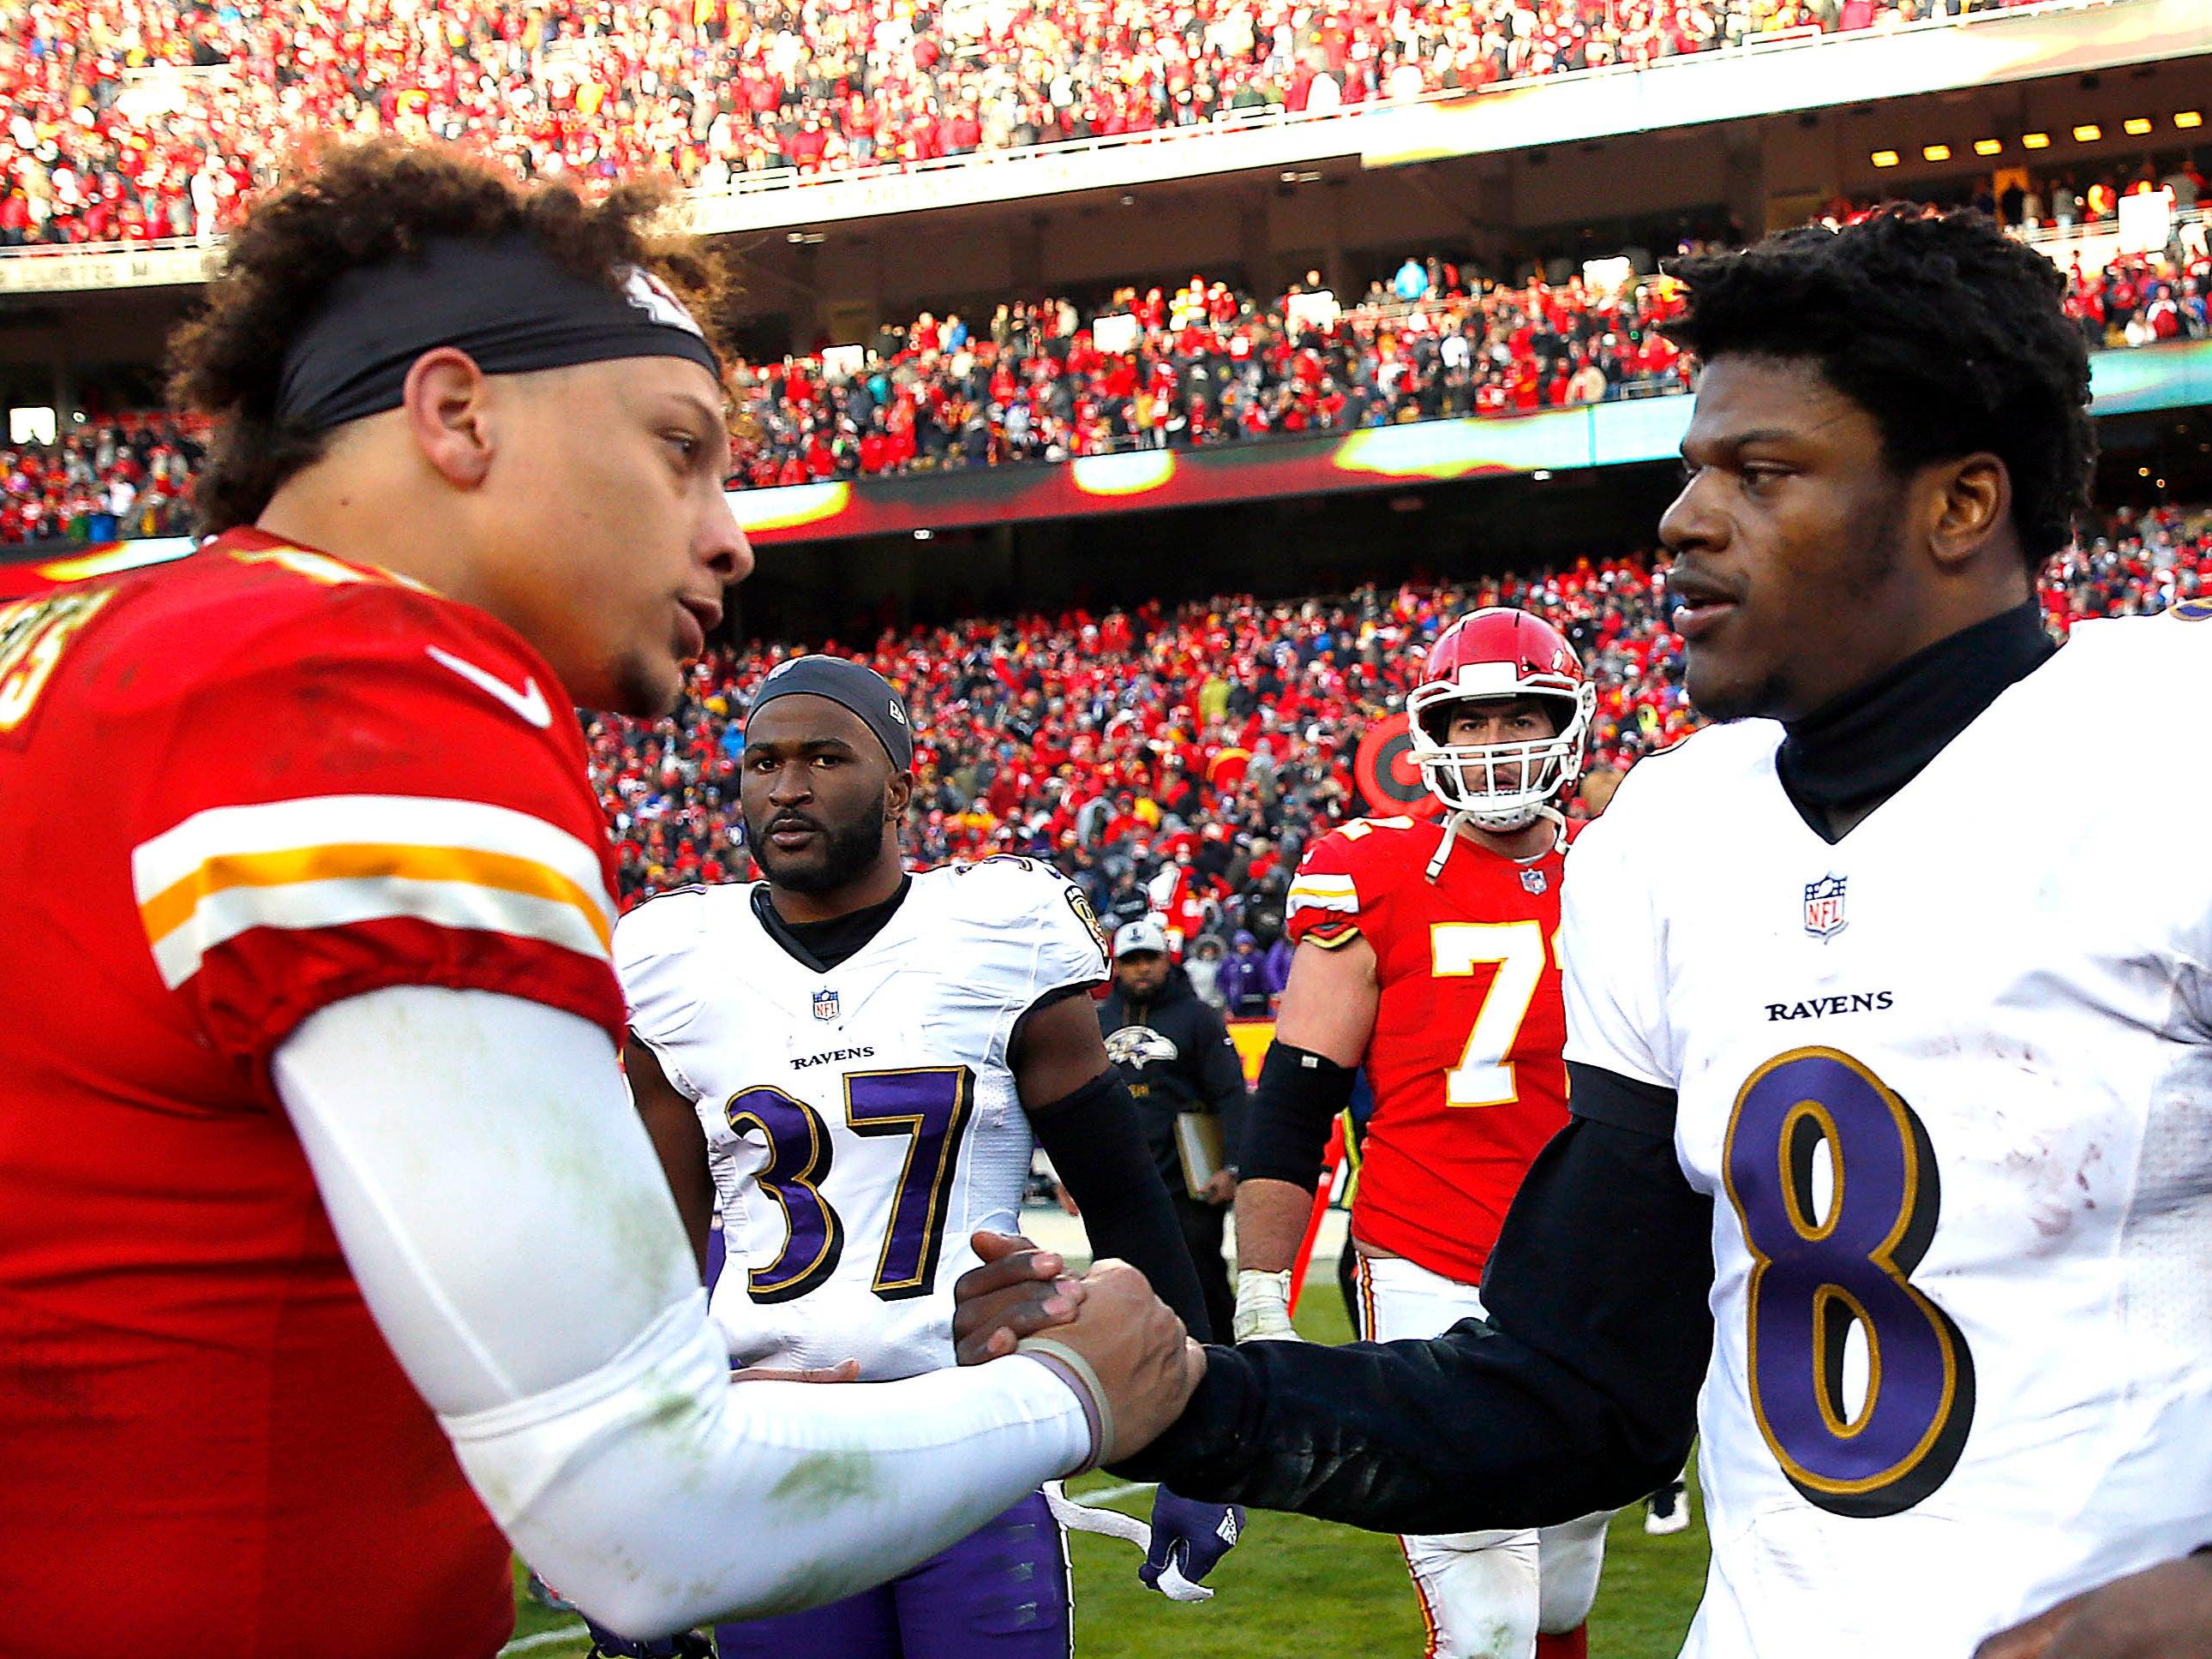 Ravens vs Chiefs: How do you stop Patrick Mahomes and Lamar ...